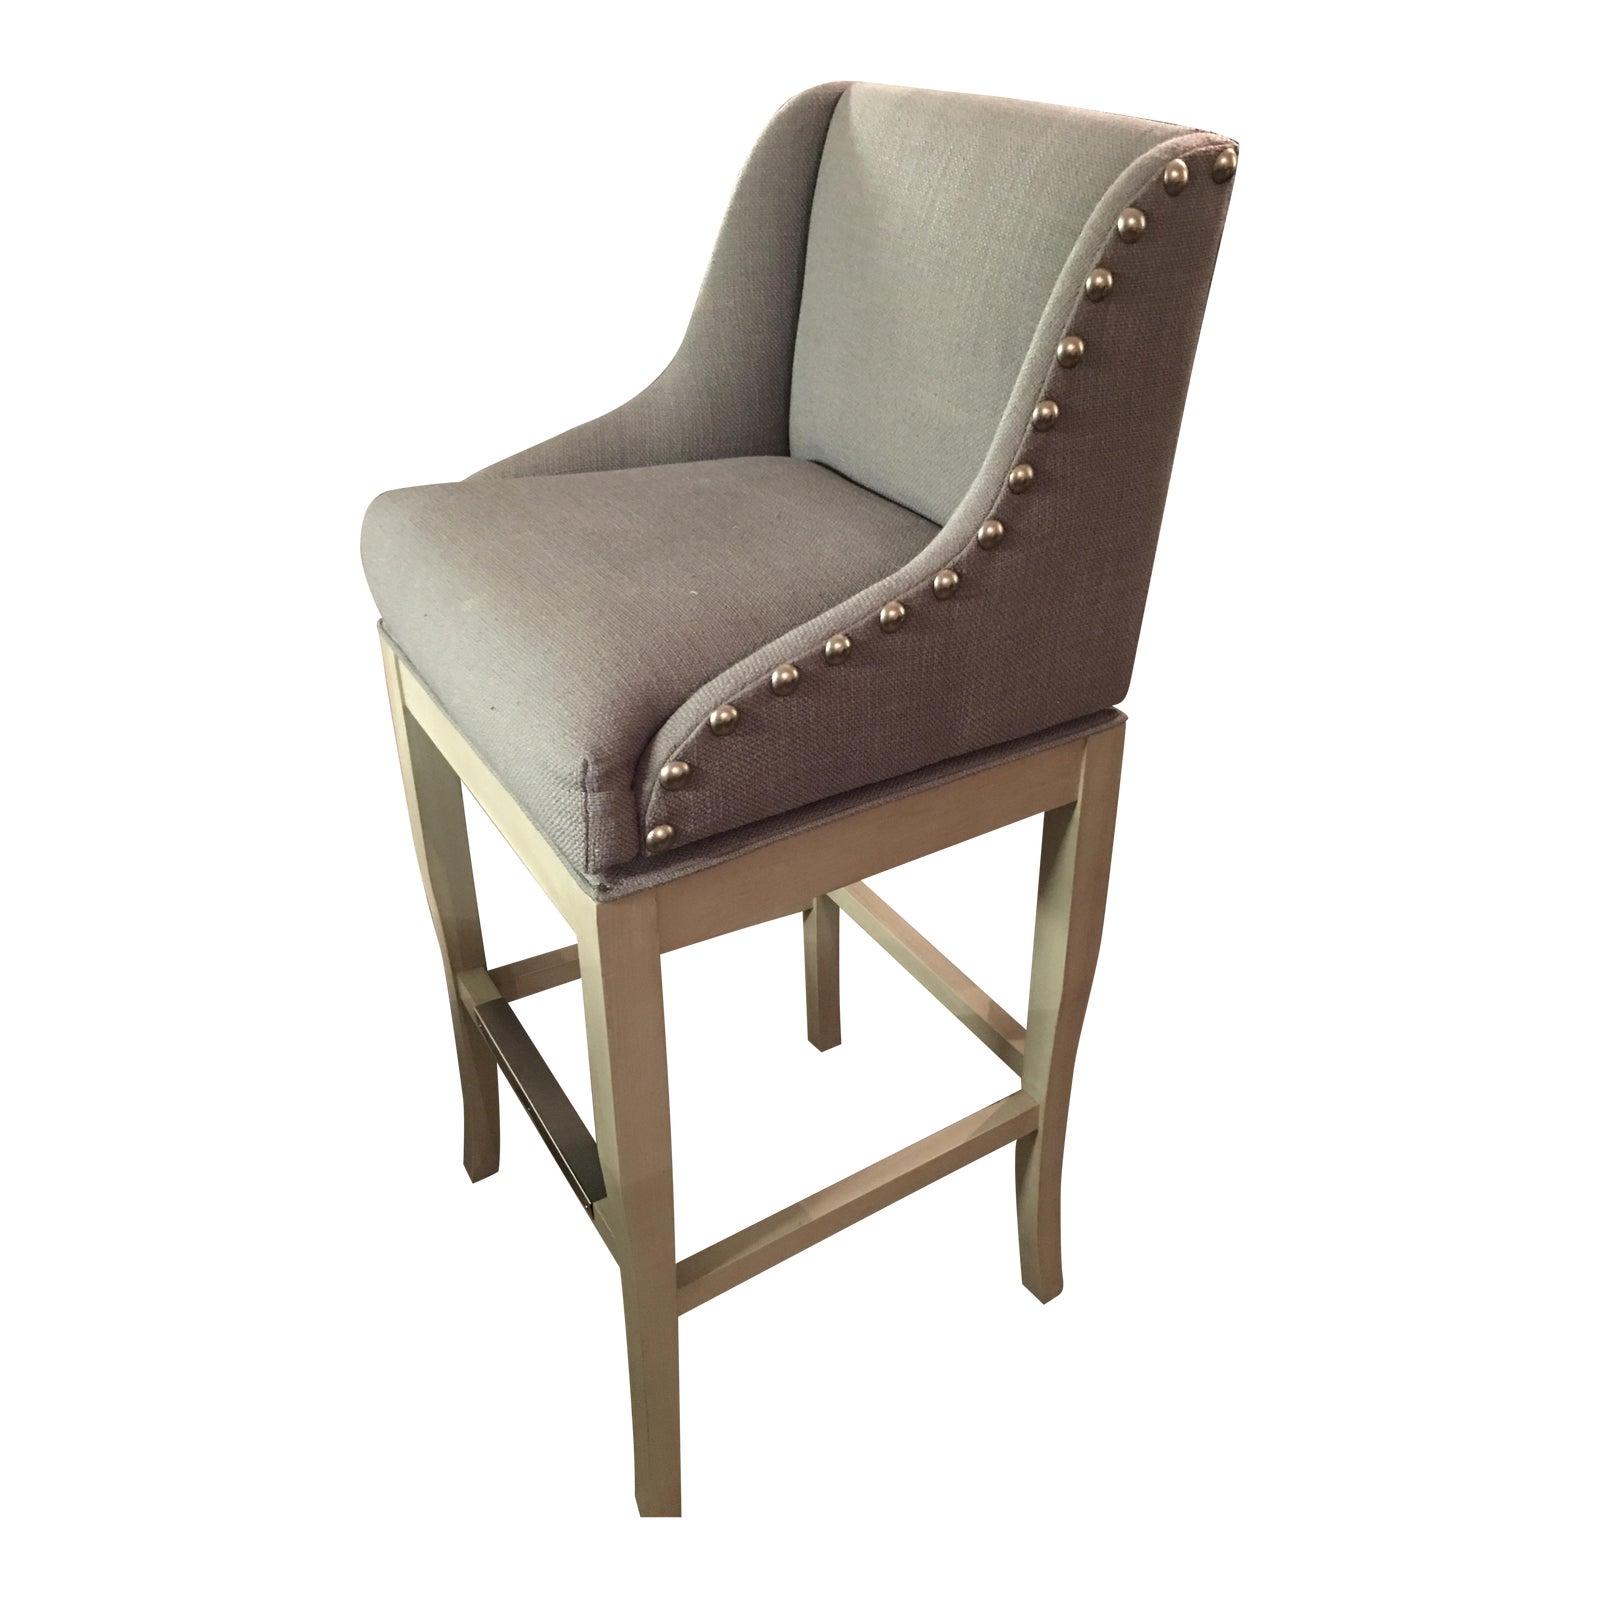 ballard design marcello bar stools - pair | chairish